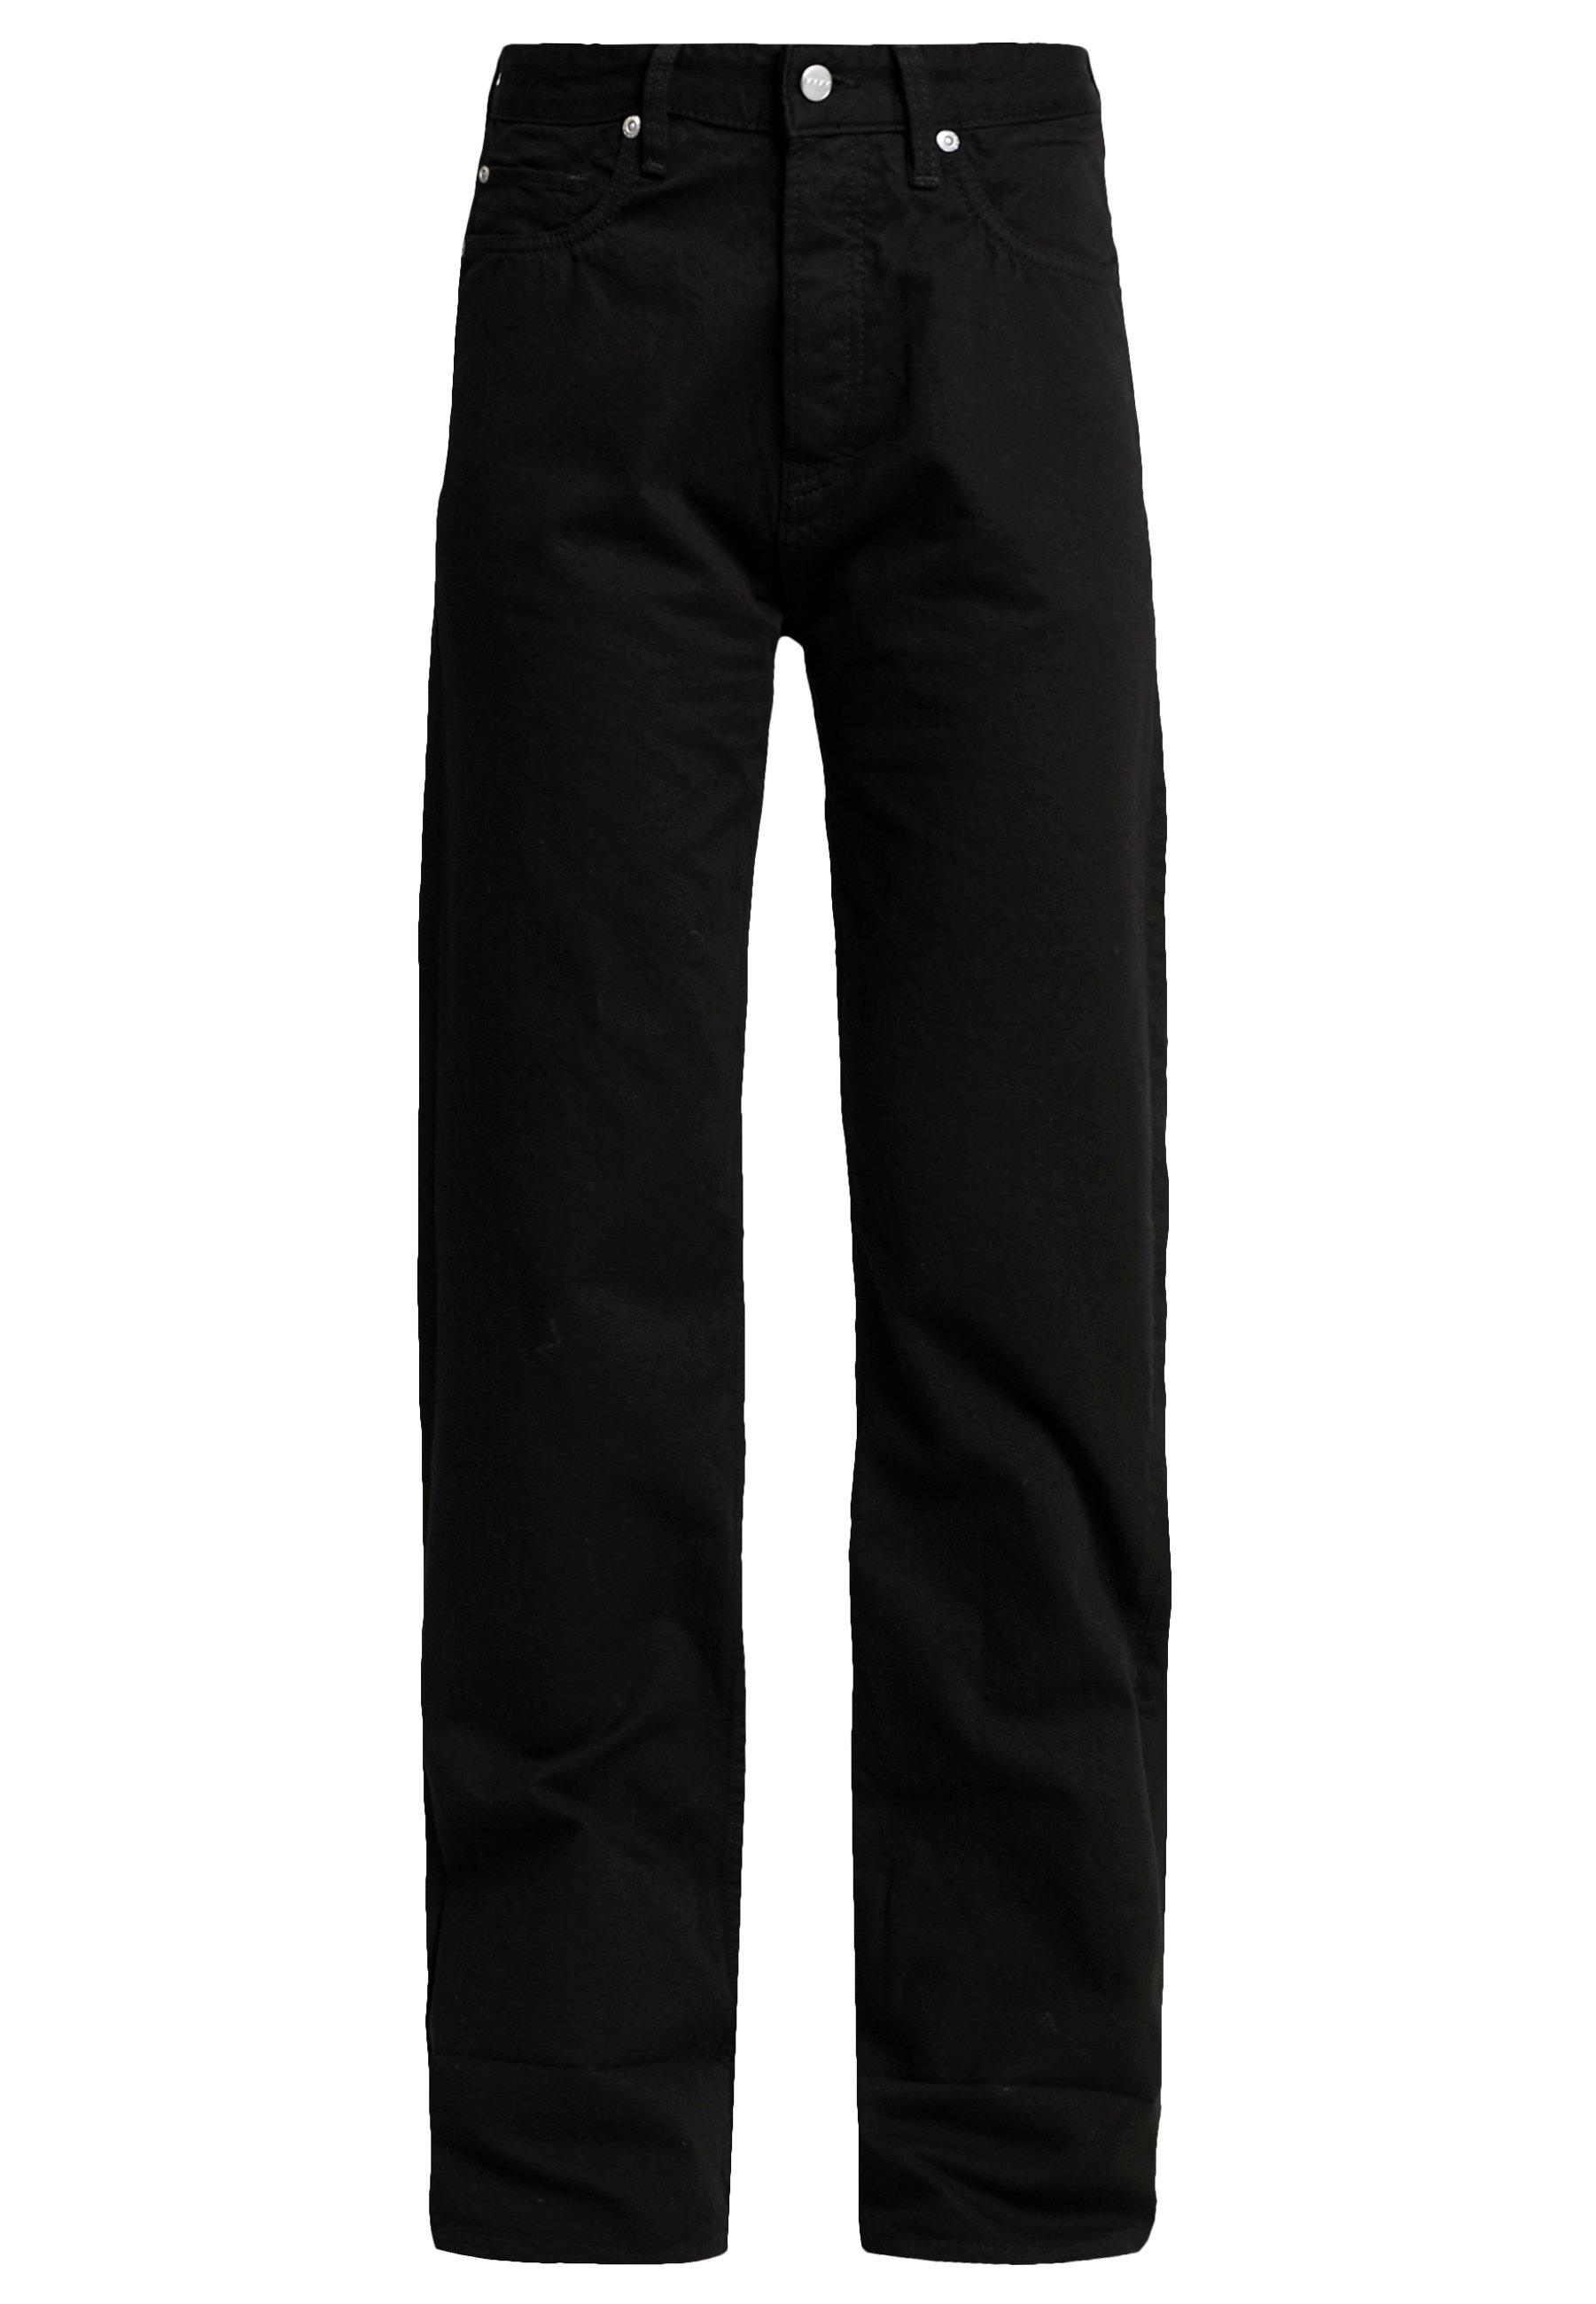 Pepe Jeans DUA LIPA x PEPE JEANS Straight leg jeans ecru